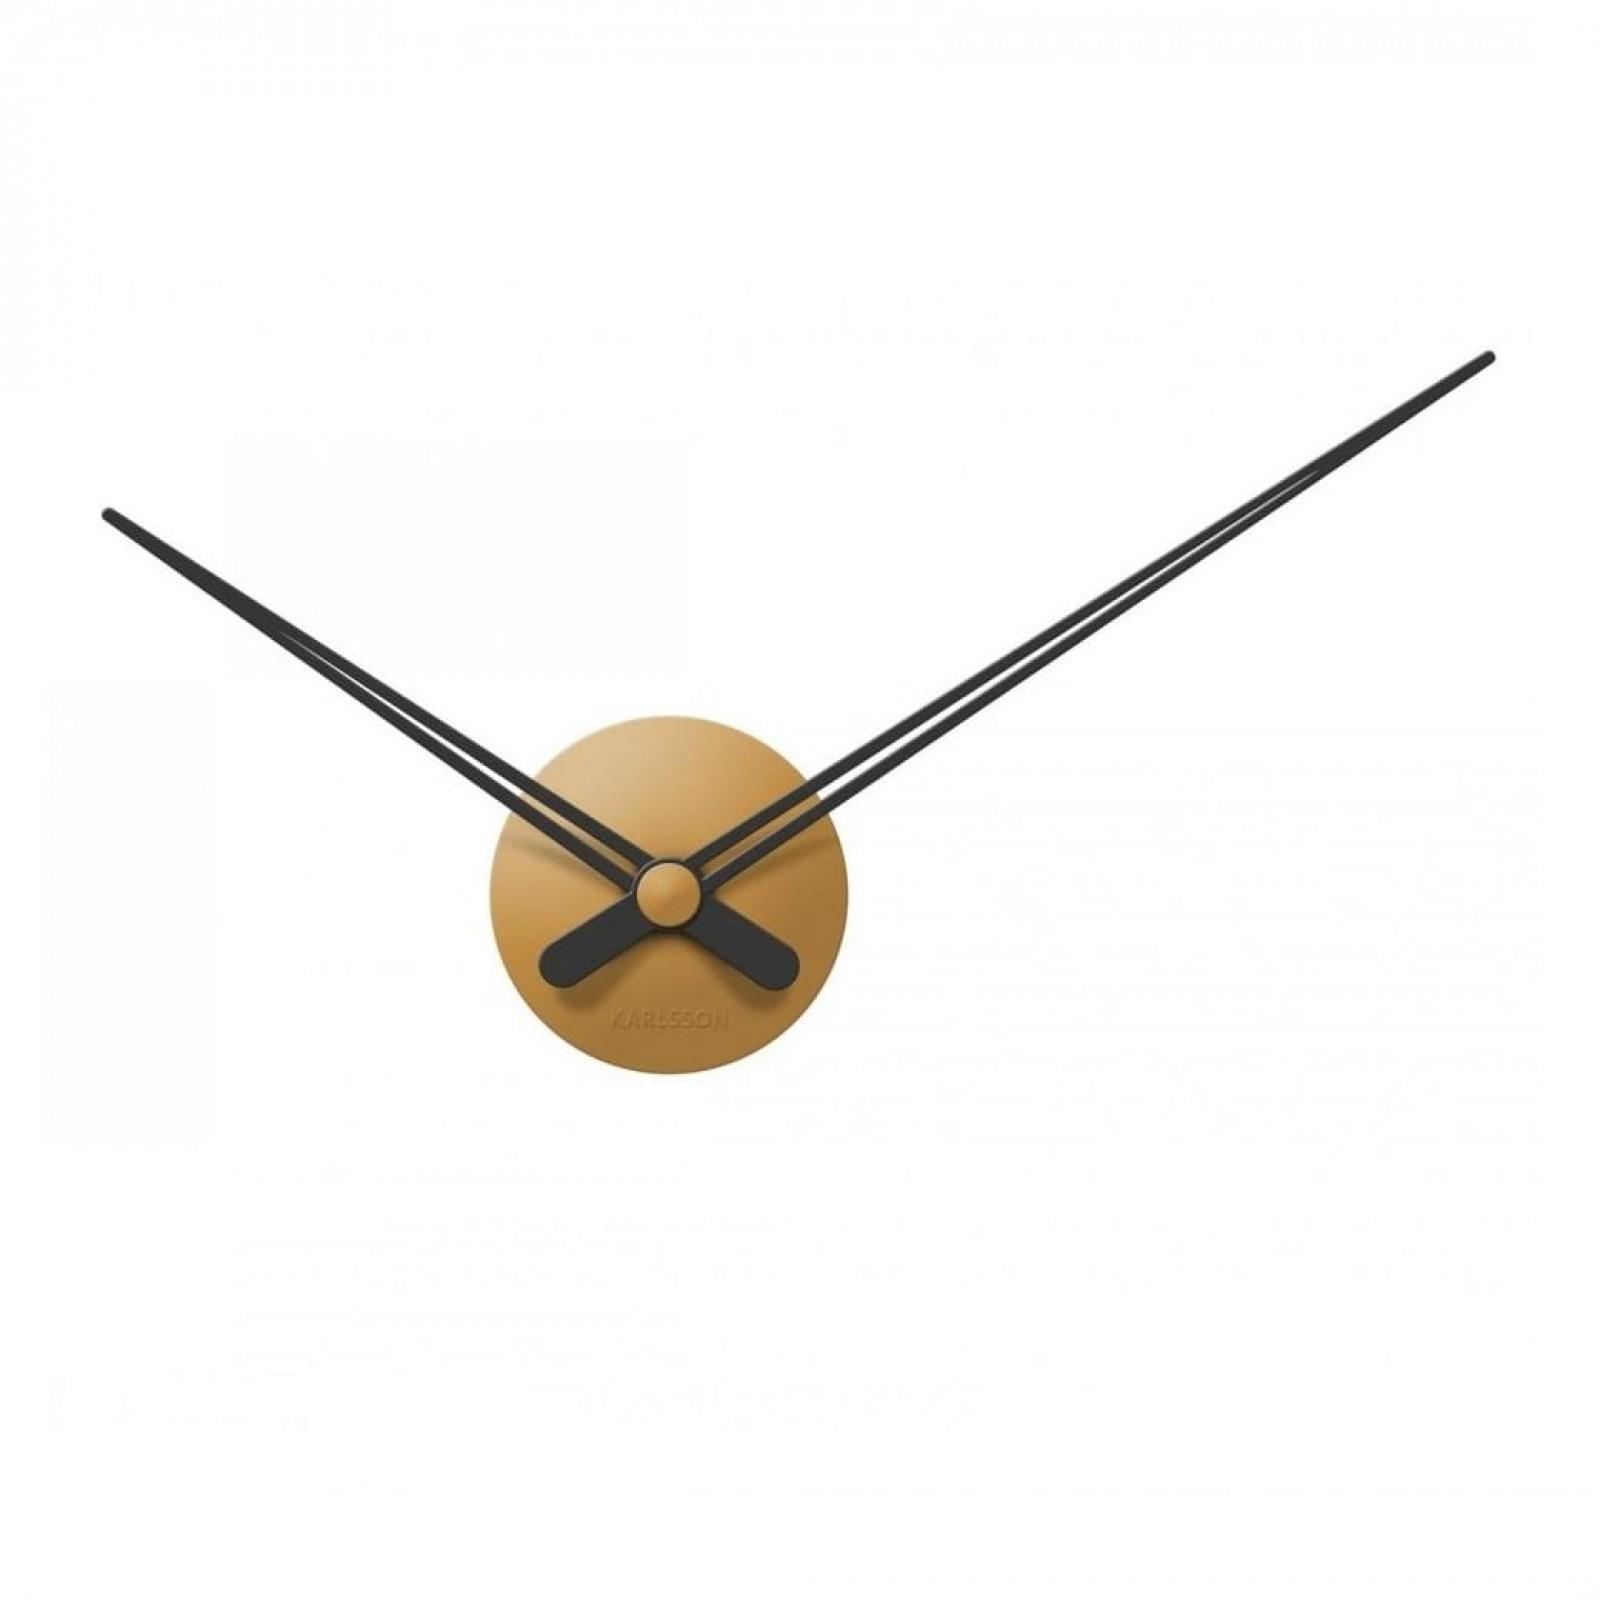 LBT Mini Sharp Wall Clock (Caramel Brown) - Karlsson